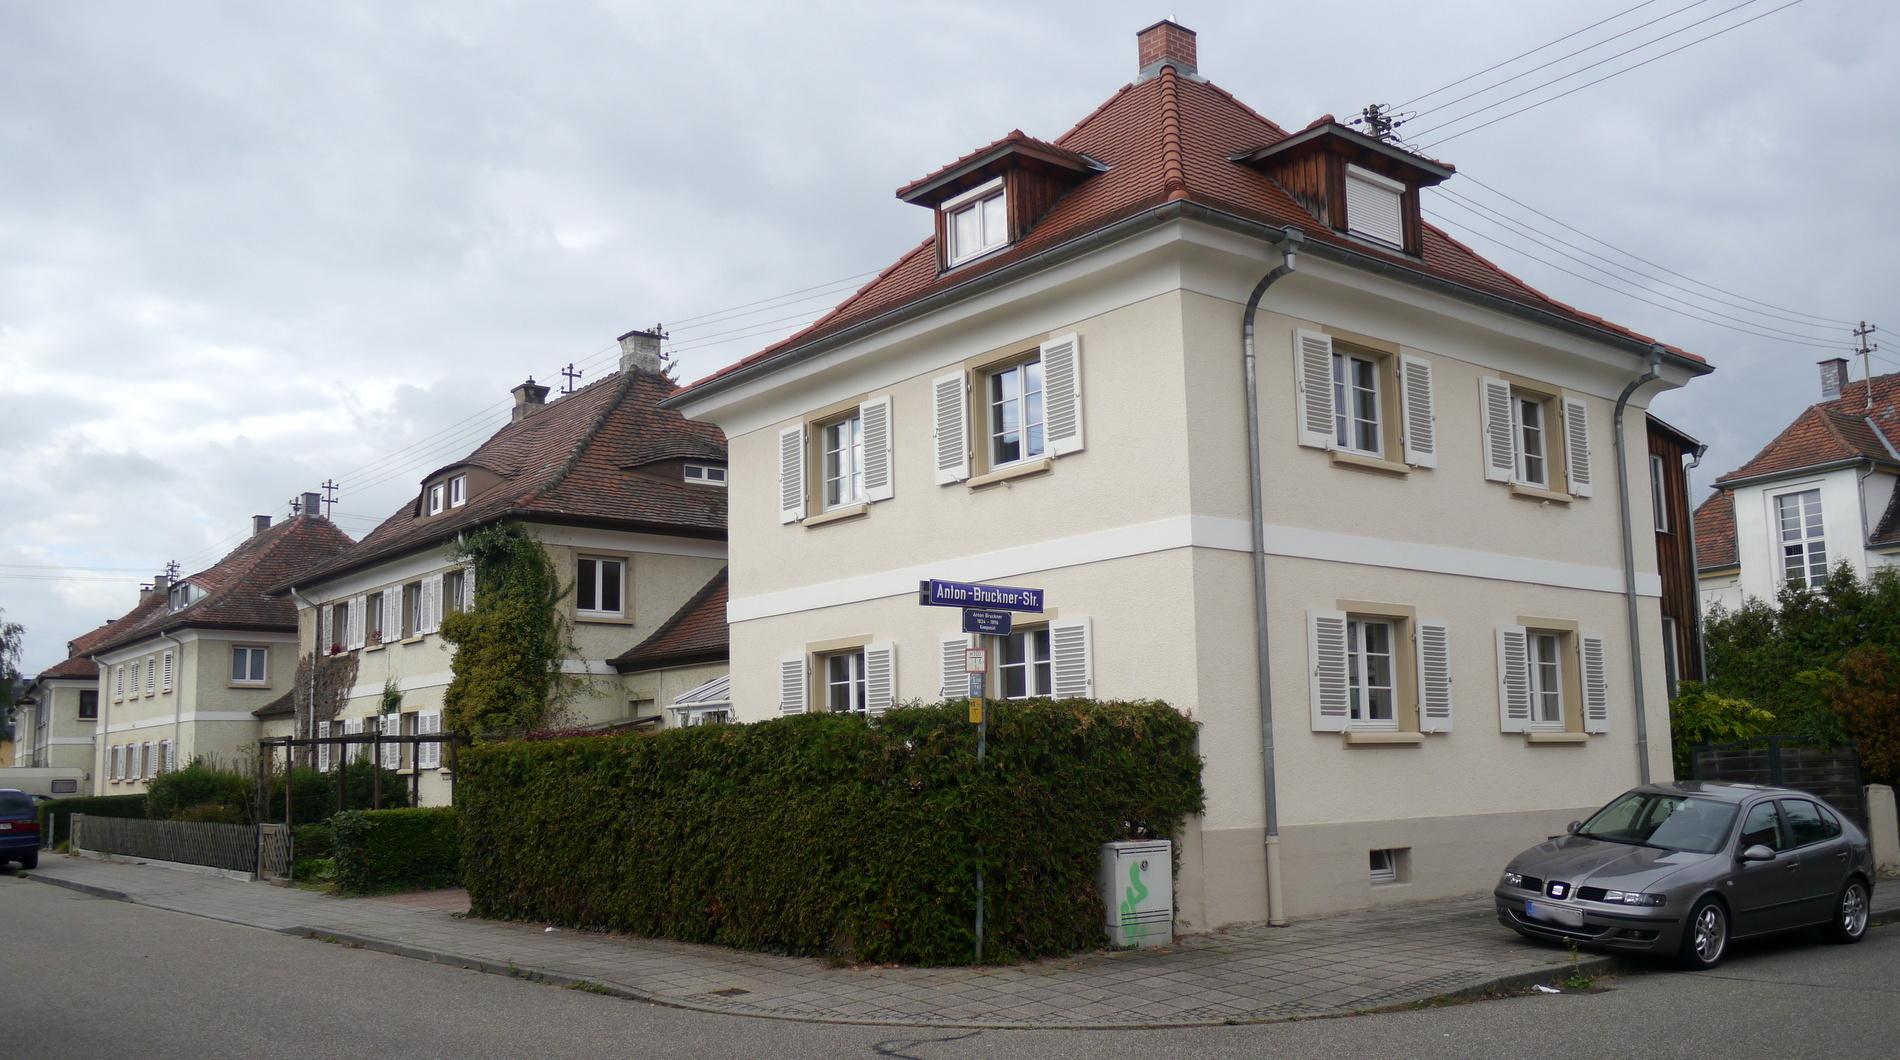 Karlsruhe: Kulturdenkmal Anton-Bruckner-Straße / Dornwaldstraße / Johann-Strauß-Straße